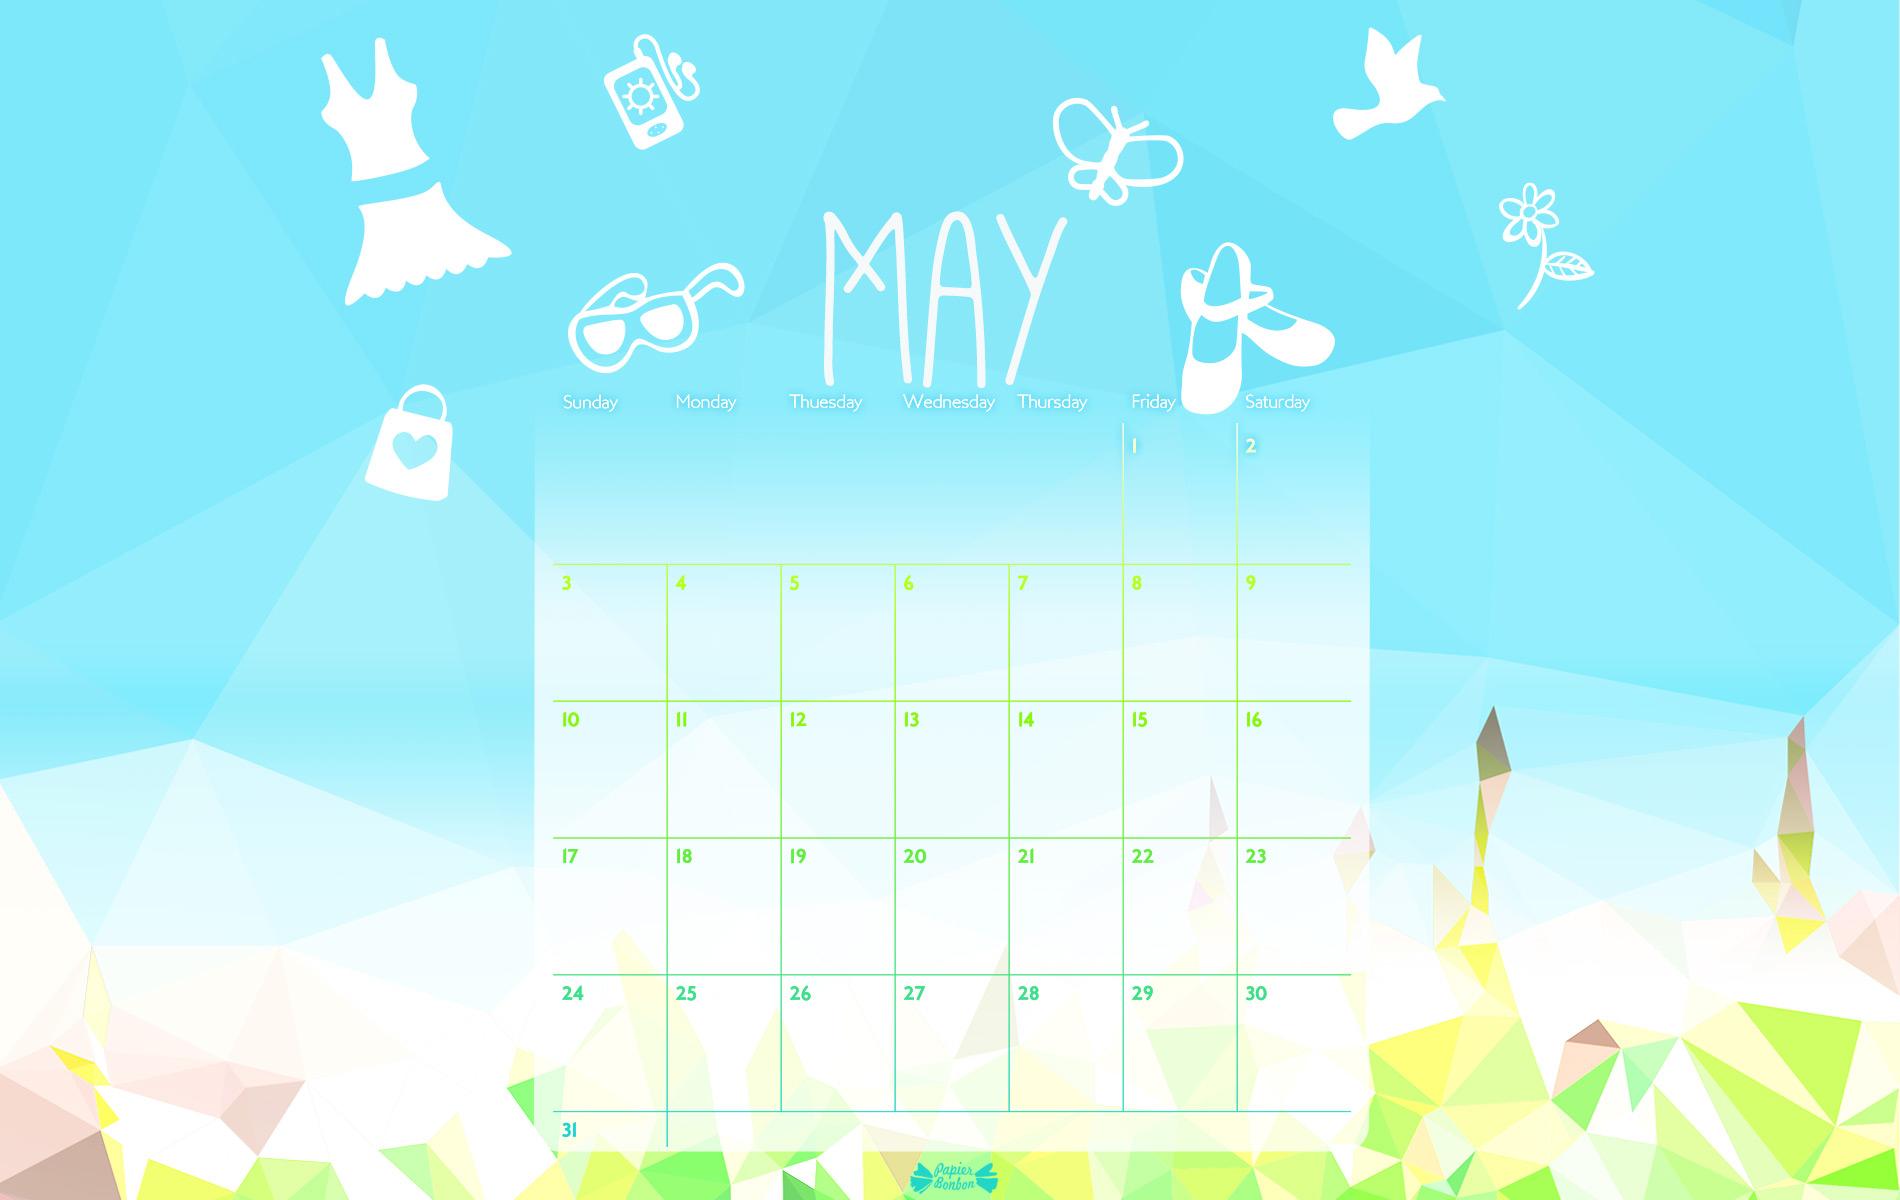 May 2015 Calendar Printable  Papier Bonbon intended for How To Make Google Calendar My Desktop Background